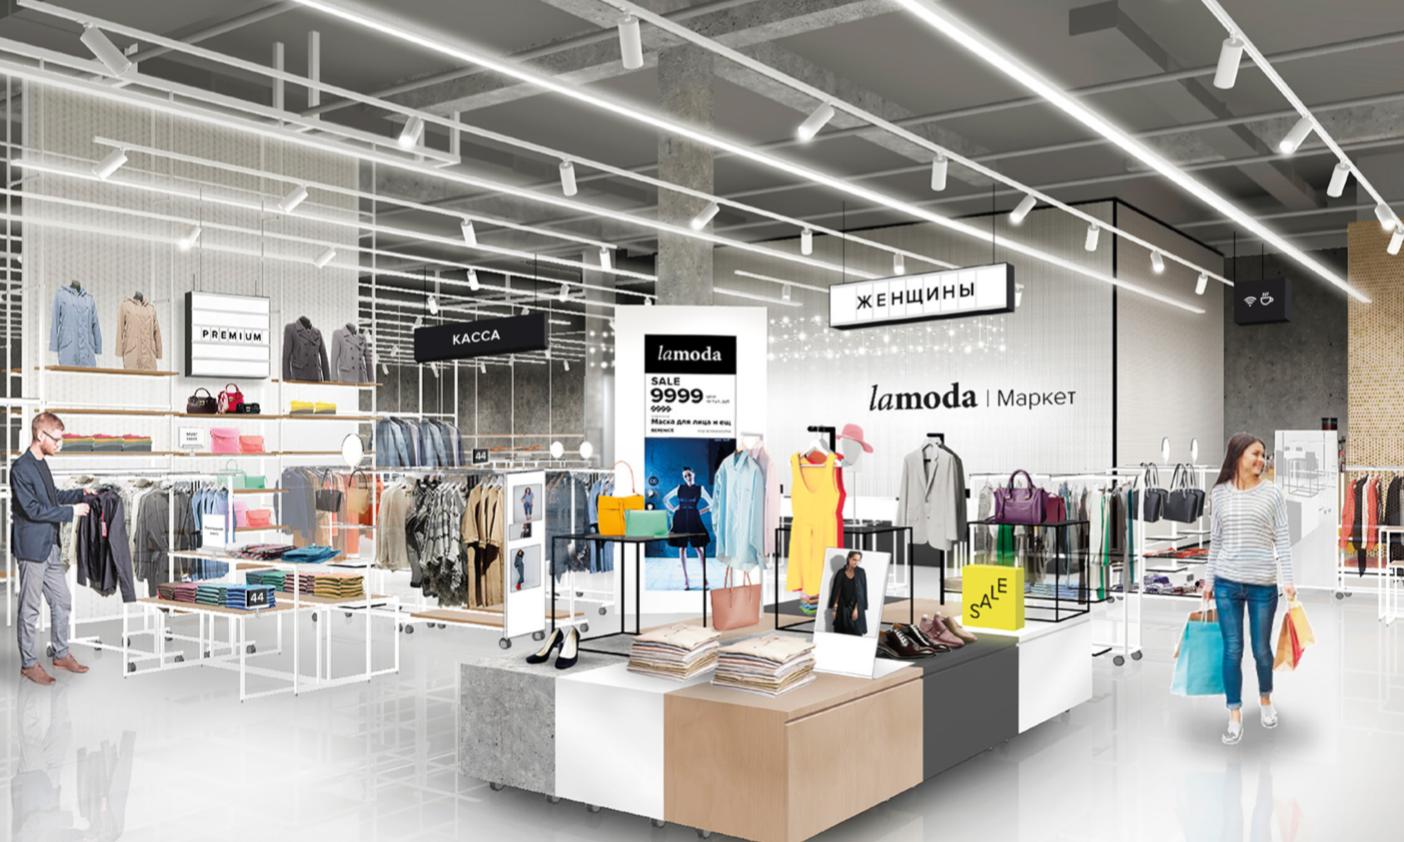 bd6a266f52667 Lamoda откроет в «Атриуме» свой первый офлайн-магазин: Яндекс.Новости